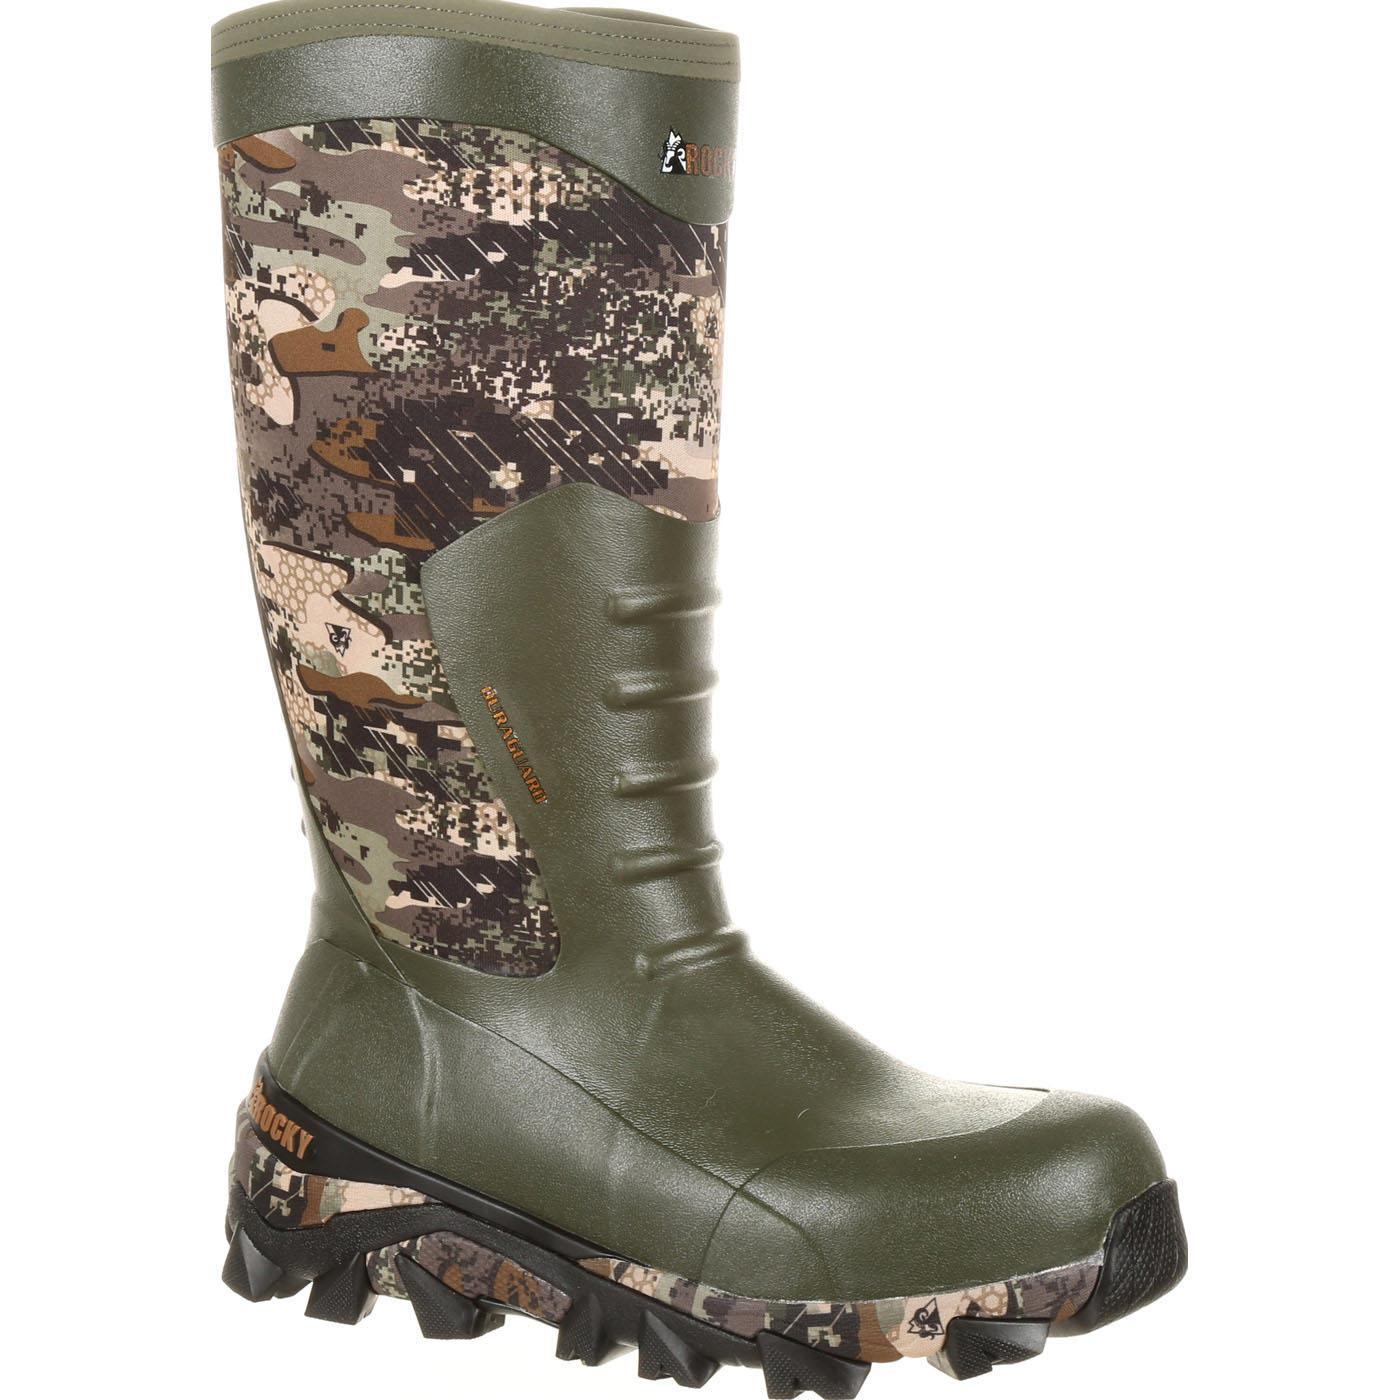 Rocky Claw Rubber Waterproof Outdoor Boot Rks0328